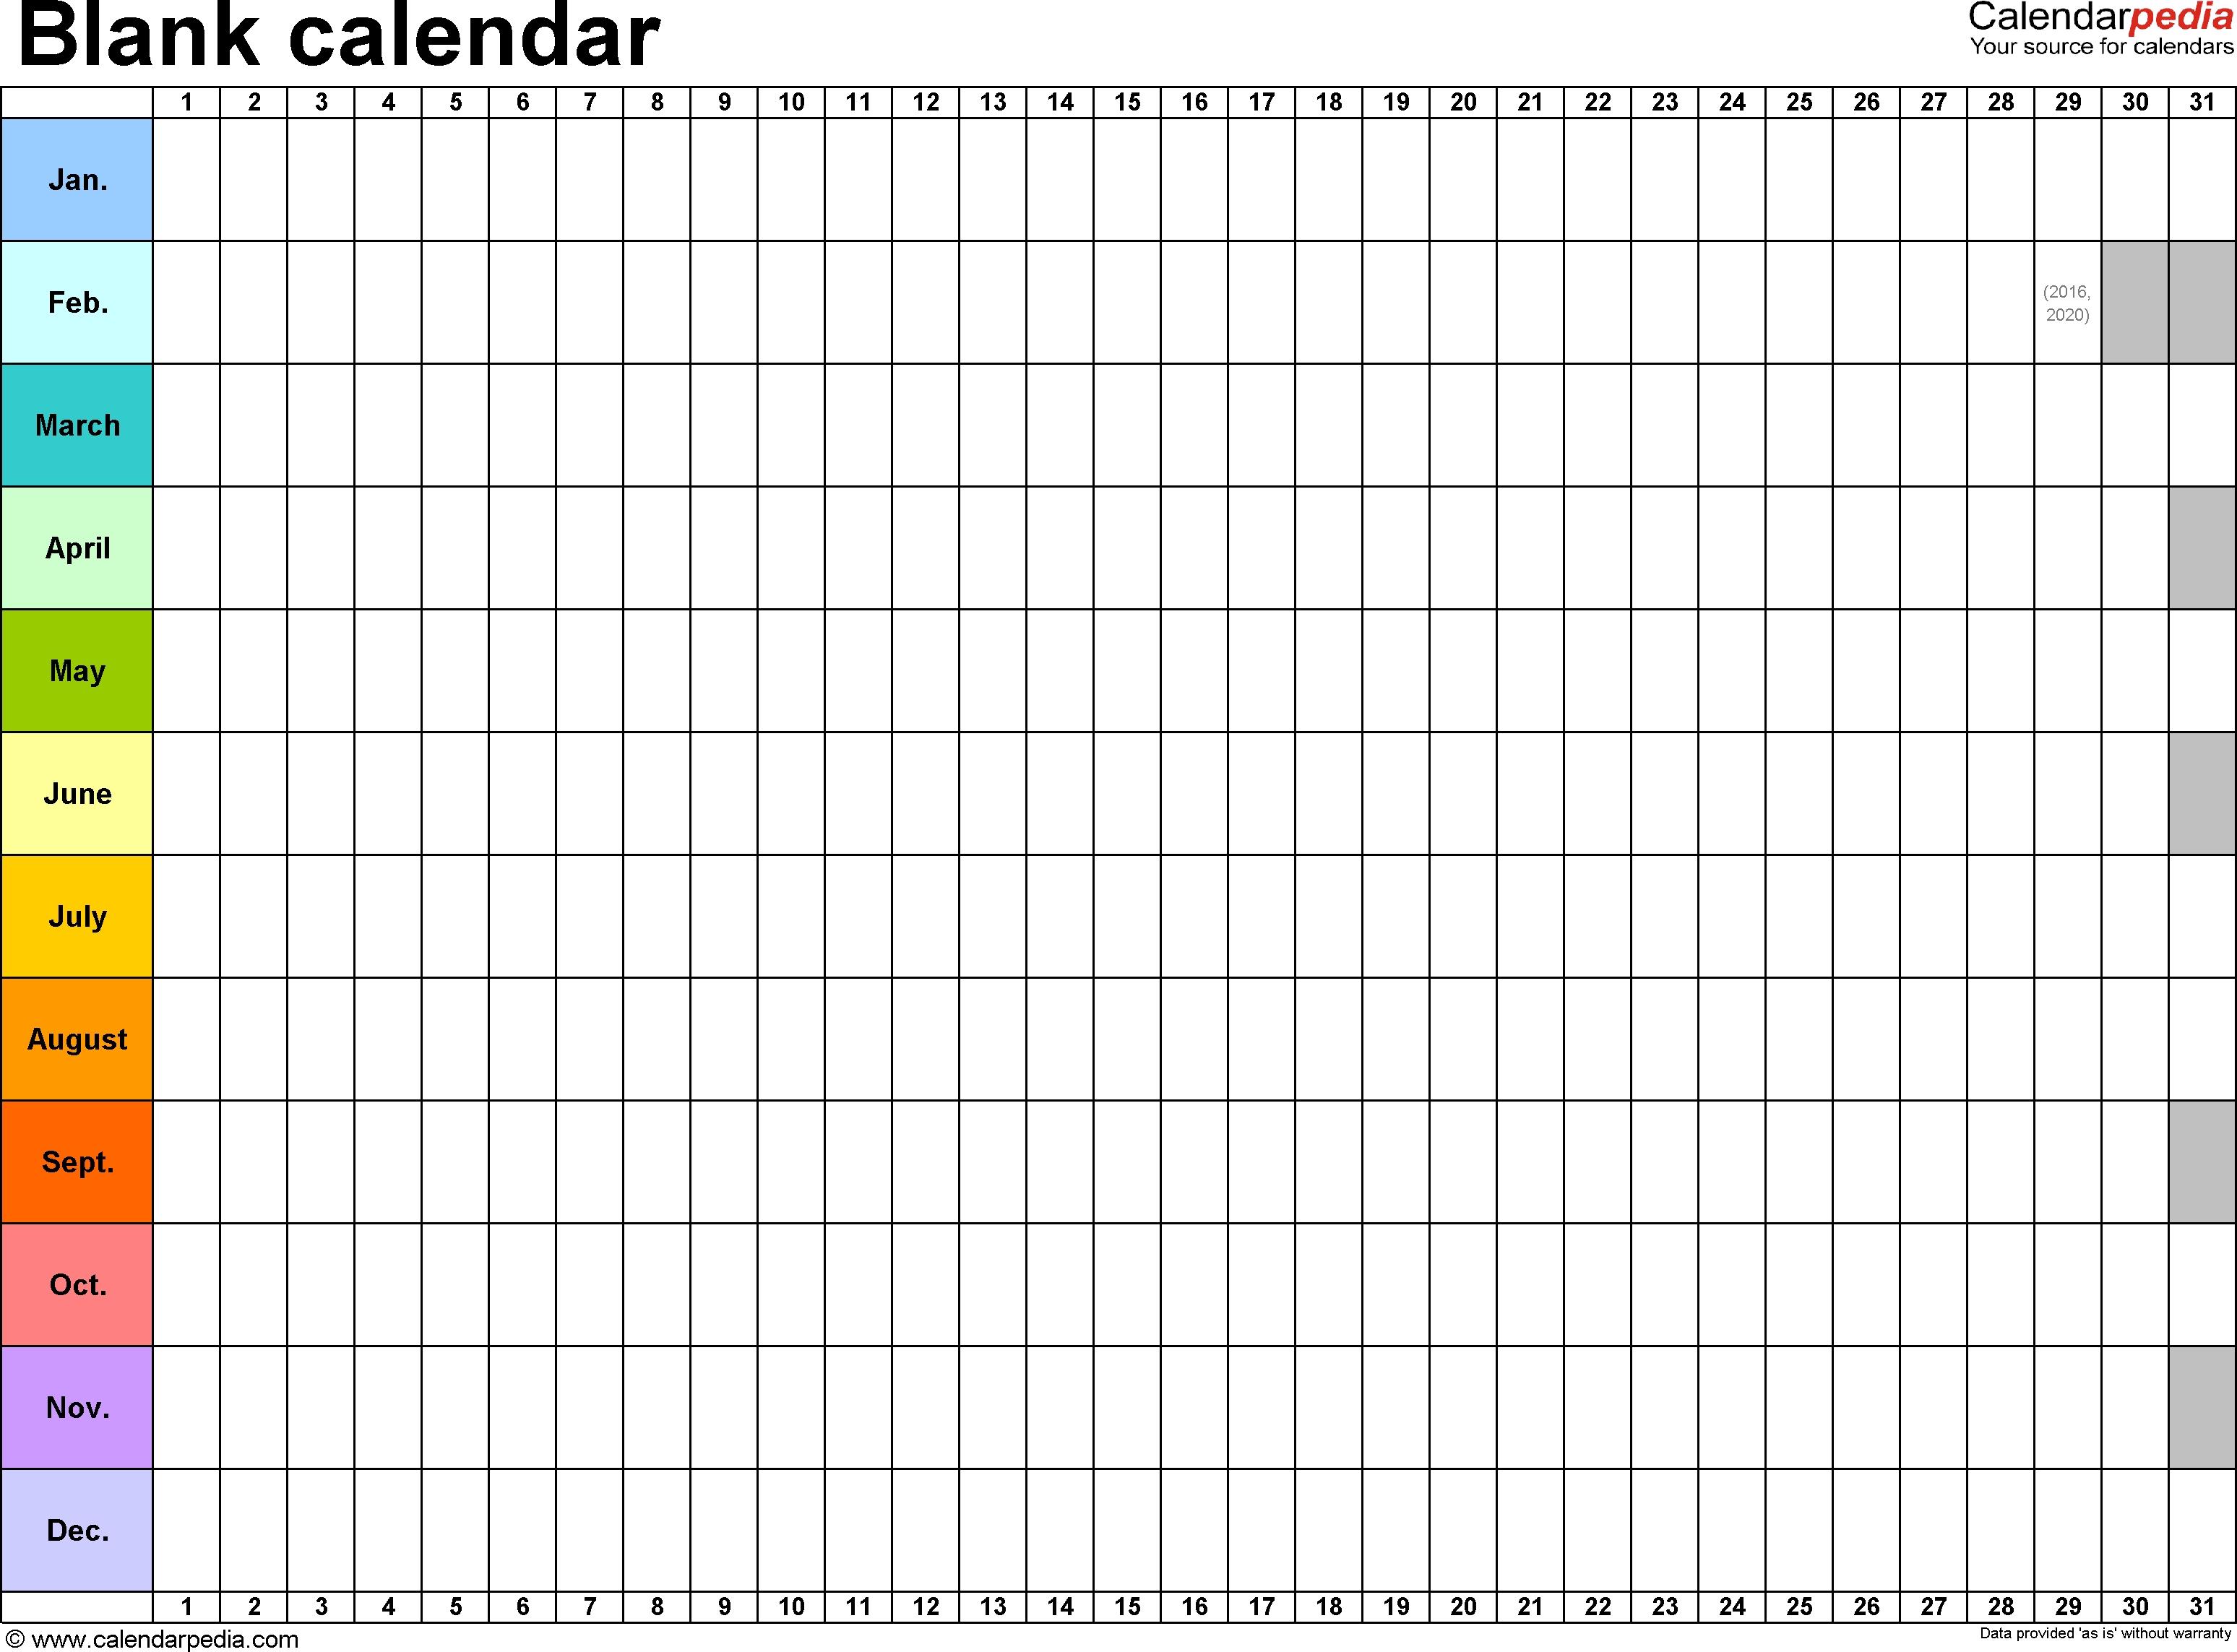 Blank Calendar - 9 Free Printable Microsoft Word Templates  1 Month Calendar Printable Blank